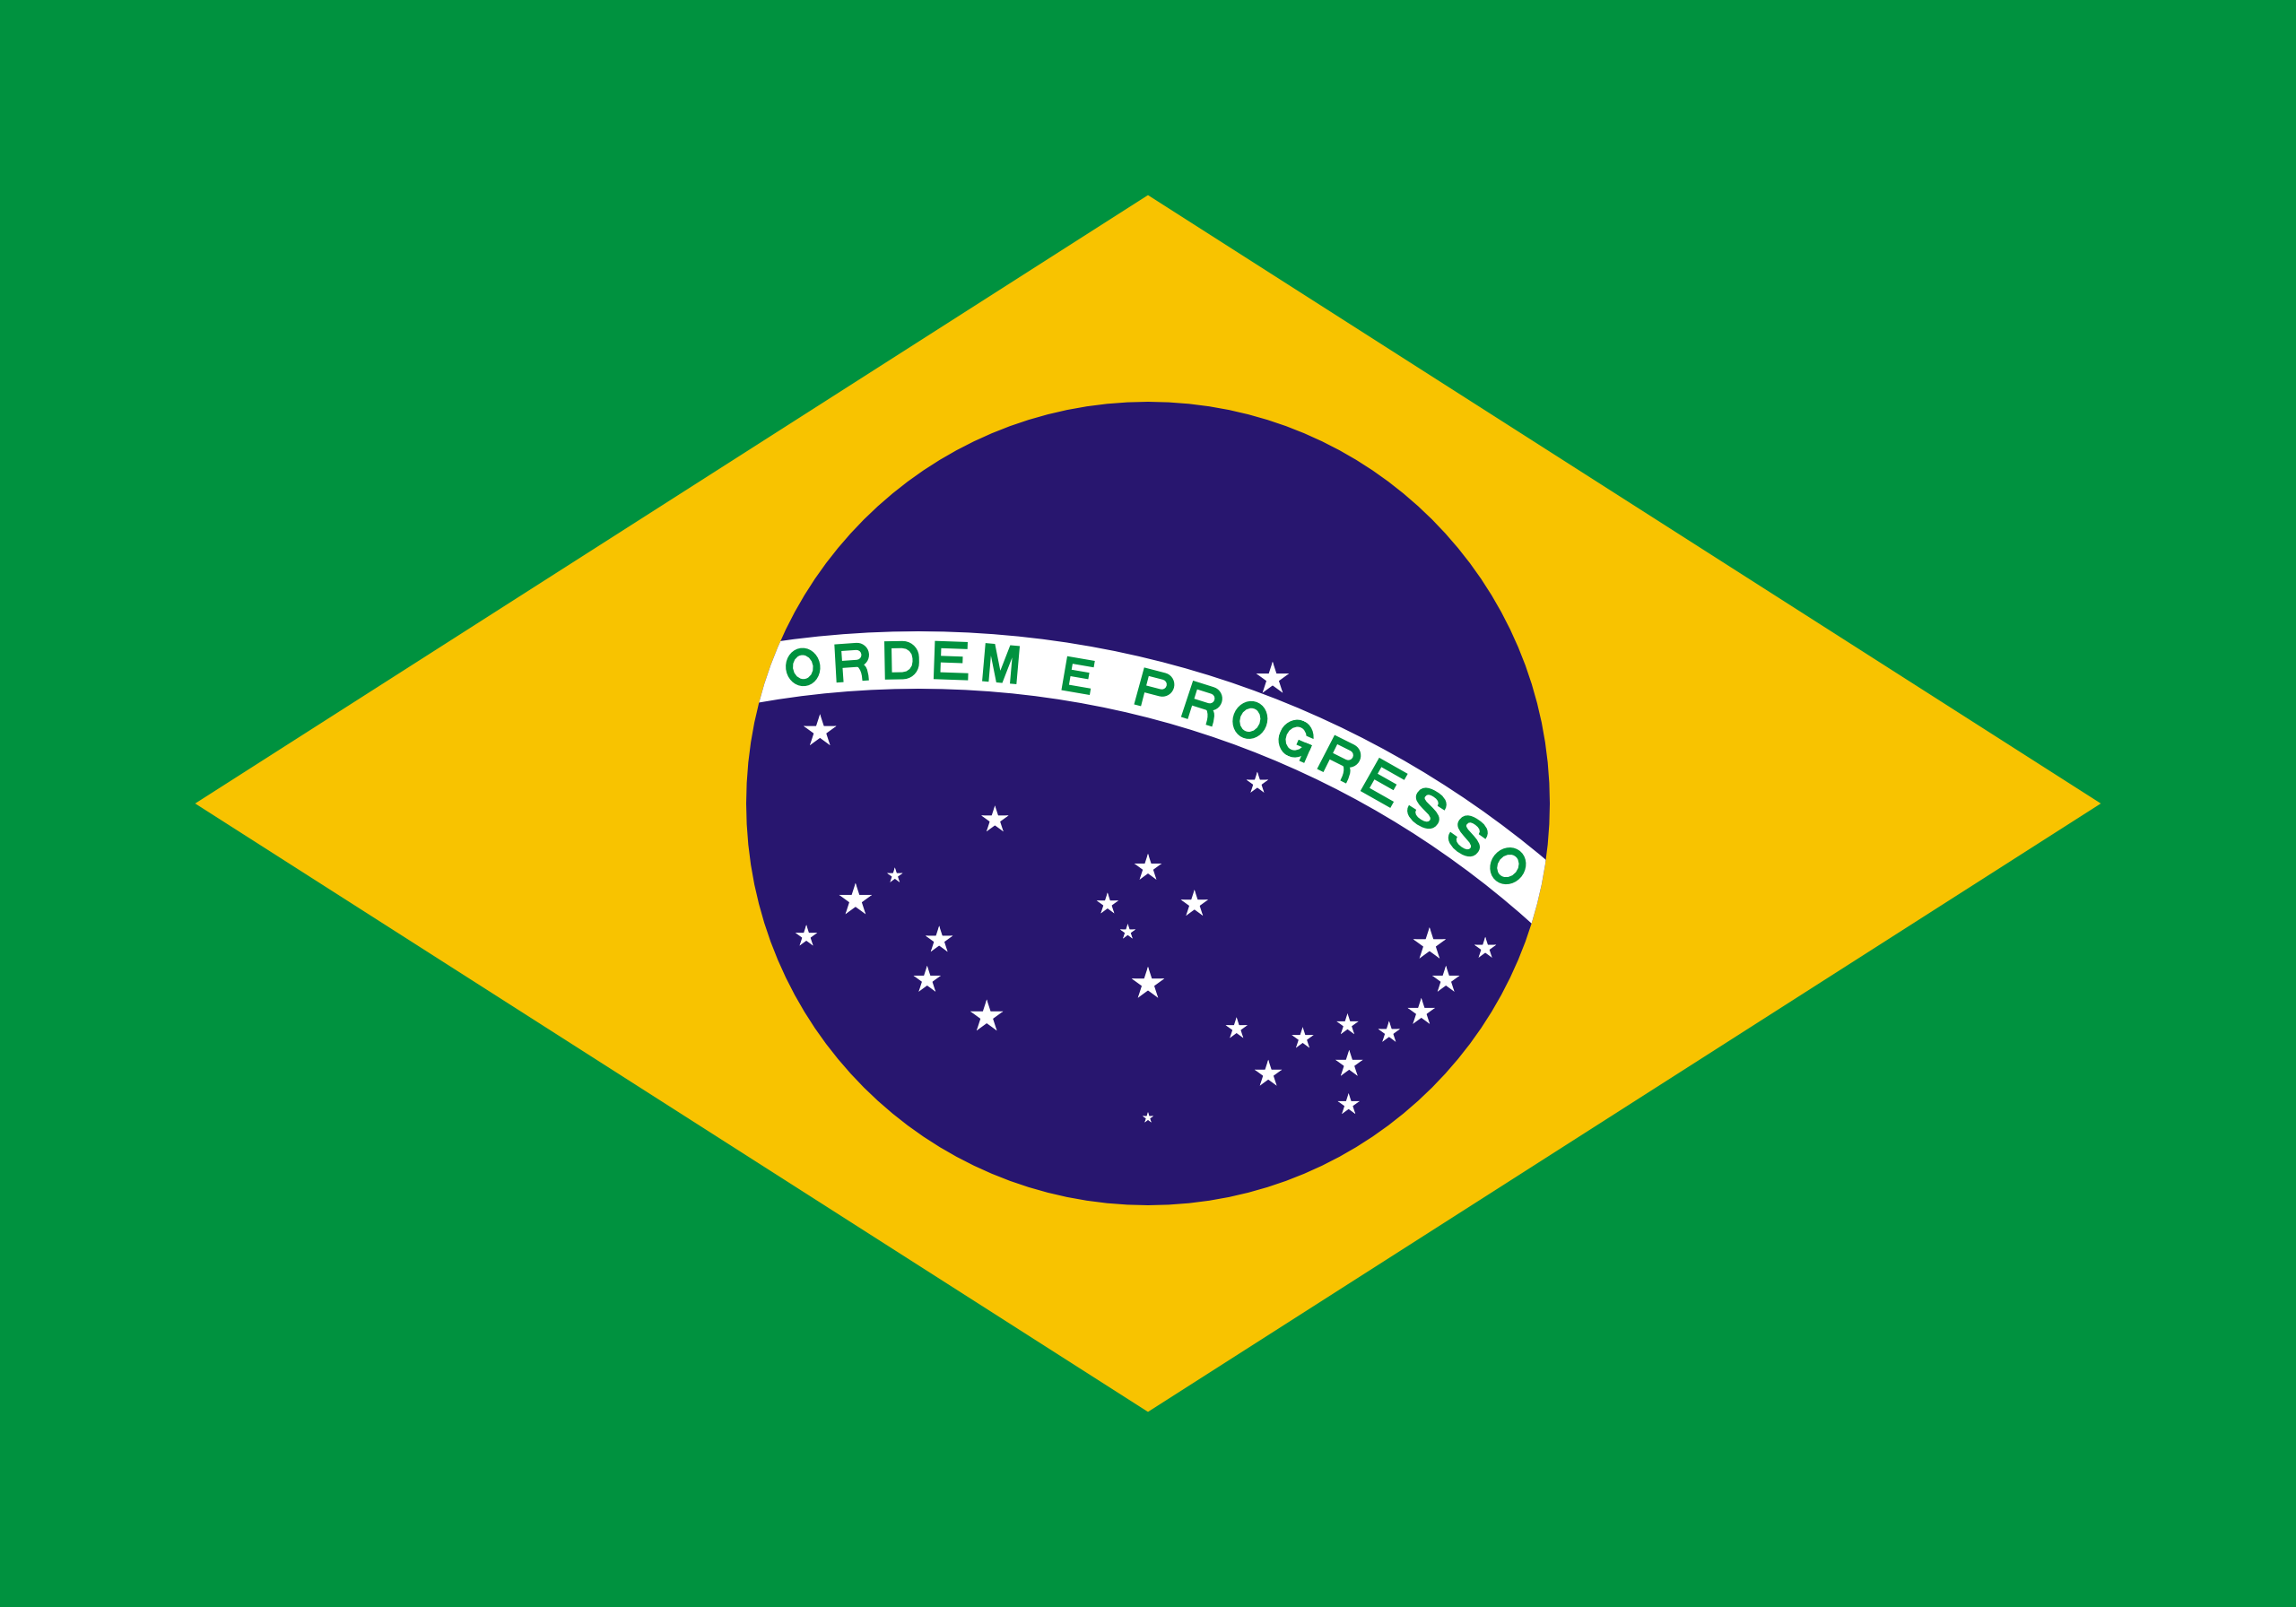 Brazilien, Land, Emblem, Logo, Symbol - Wallpaper HD - Prof.-falken.com